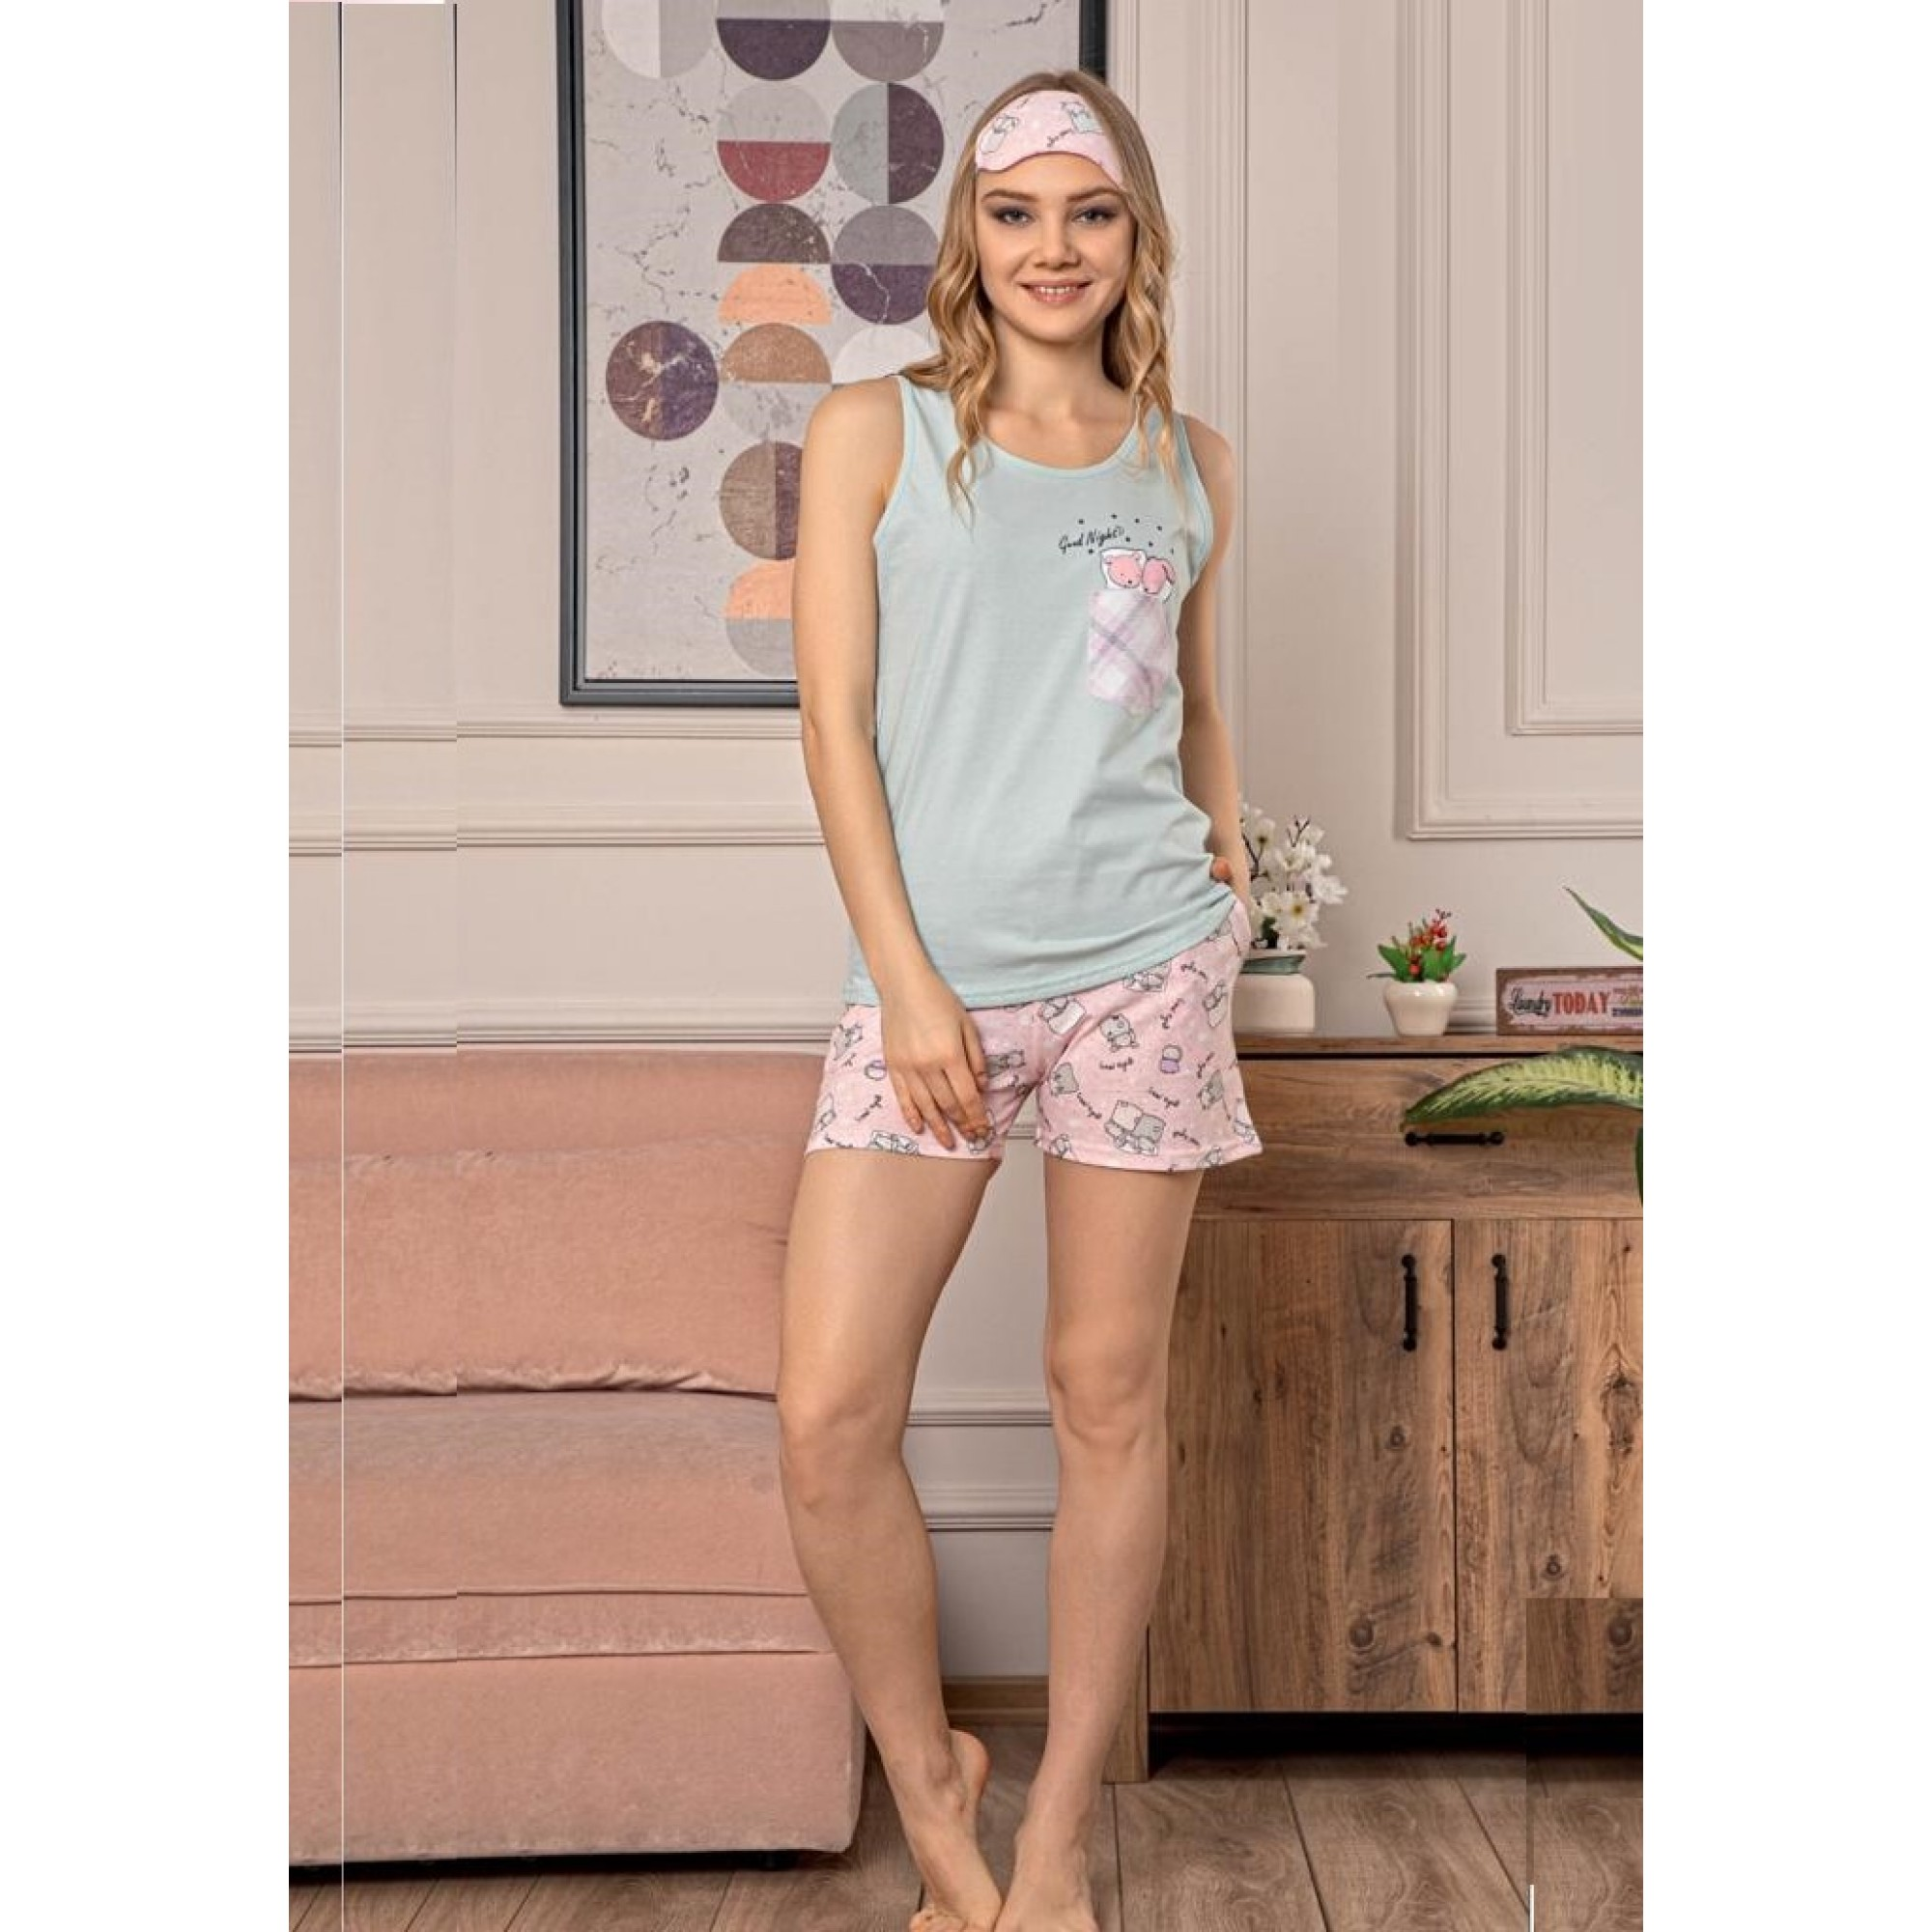 Good night дамска лятна пижама